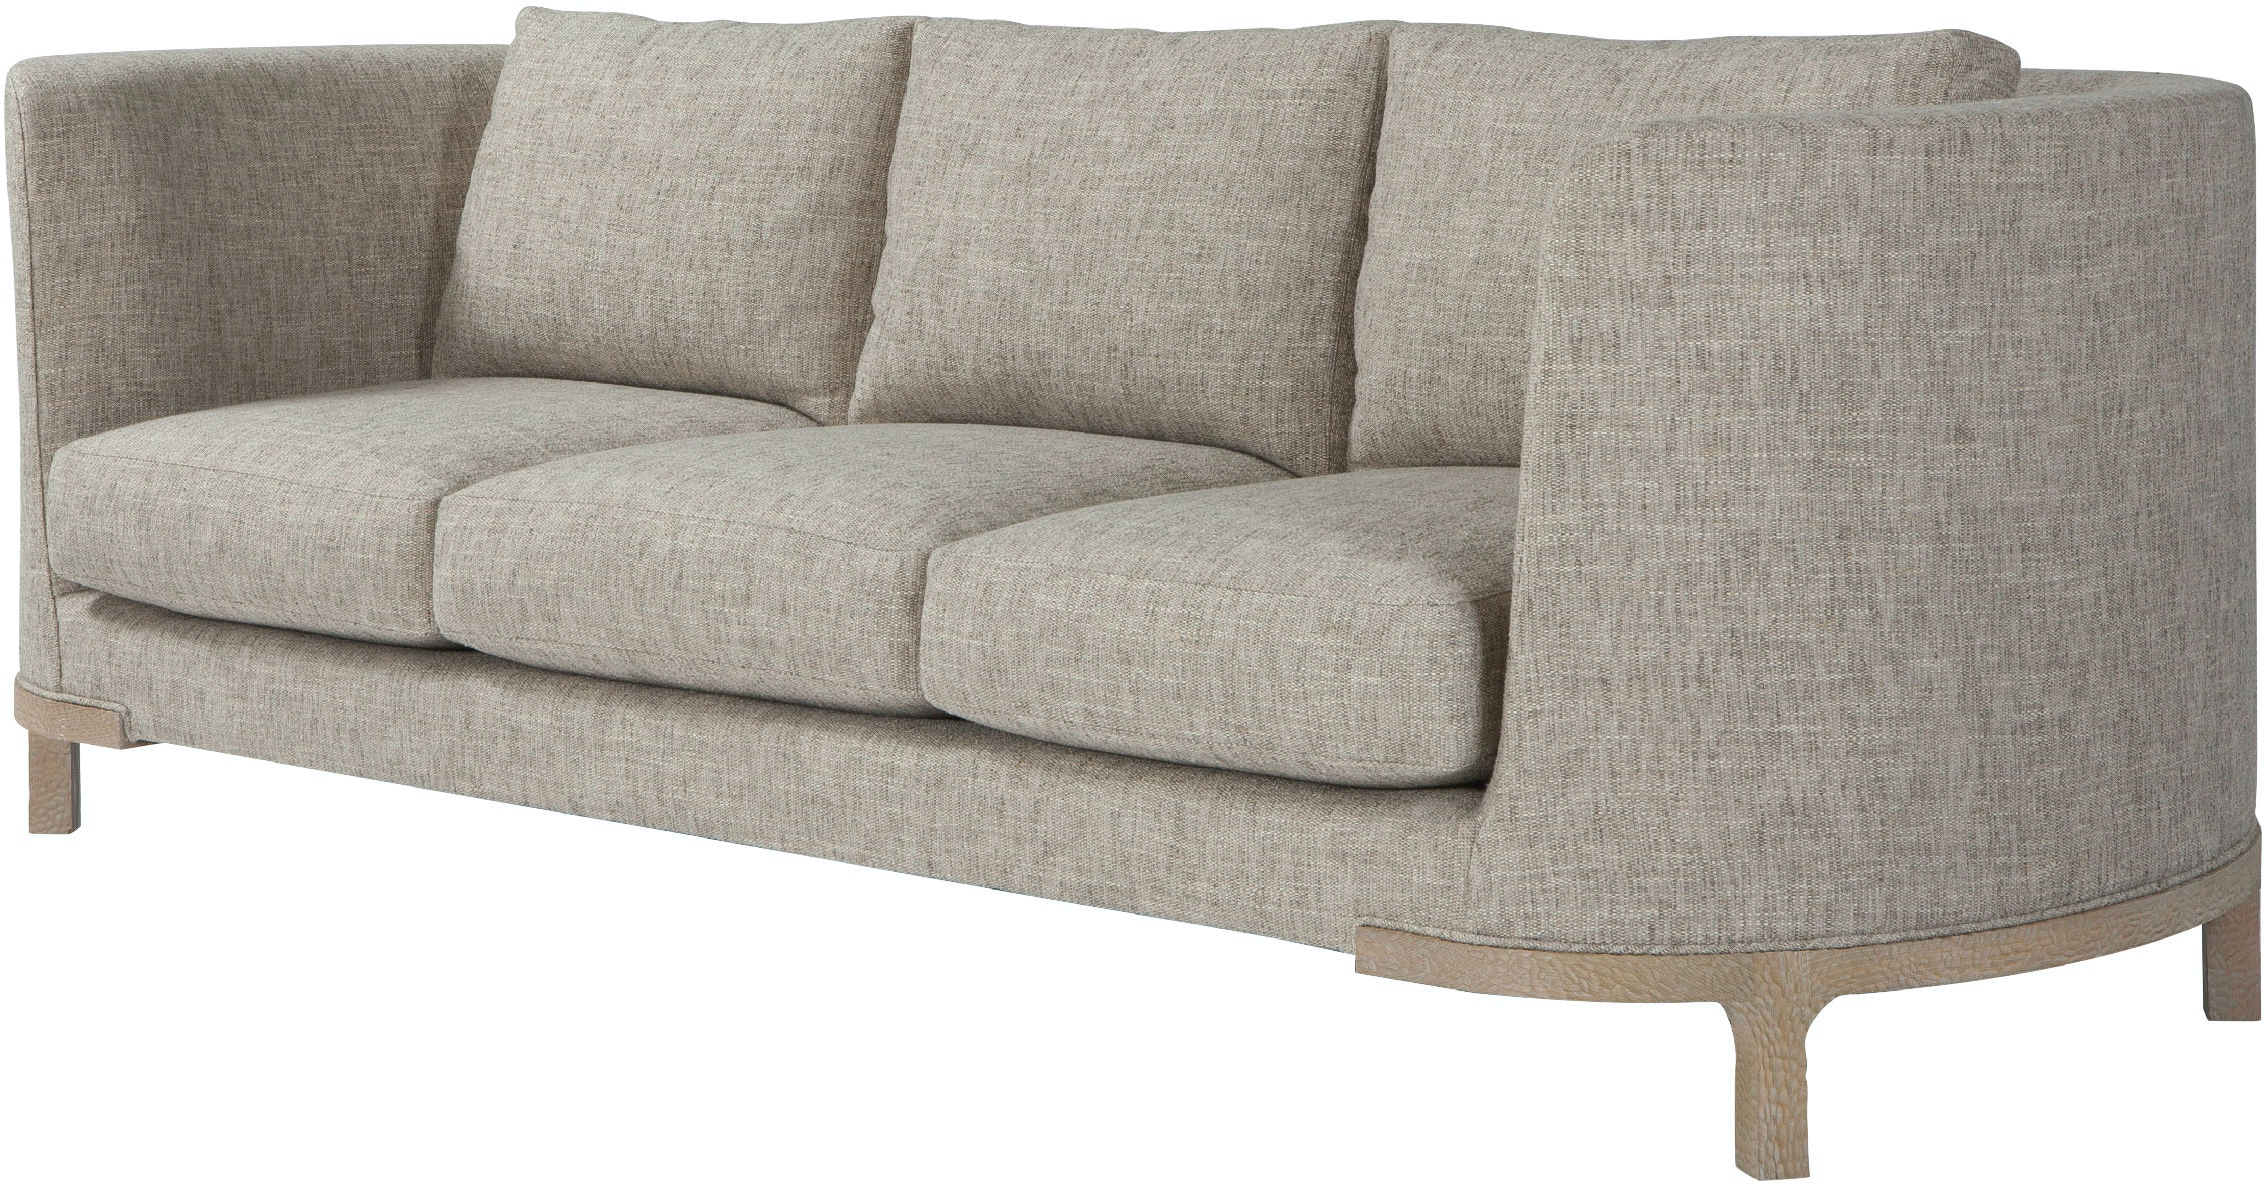 Theodore Alexander Living Room Camino Sofa Mb500 30